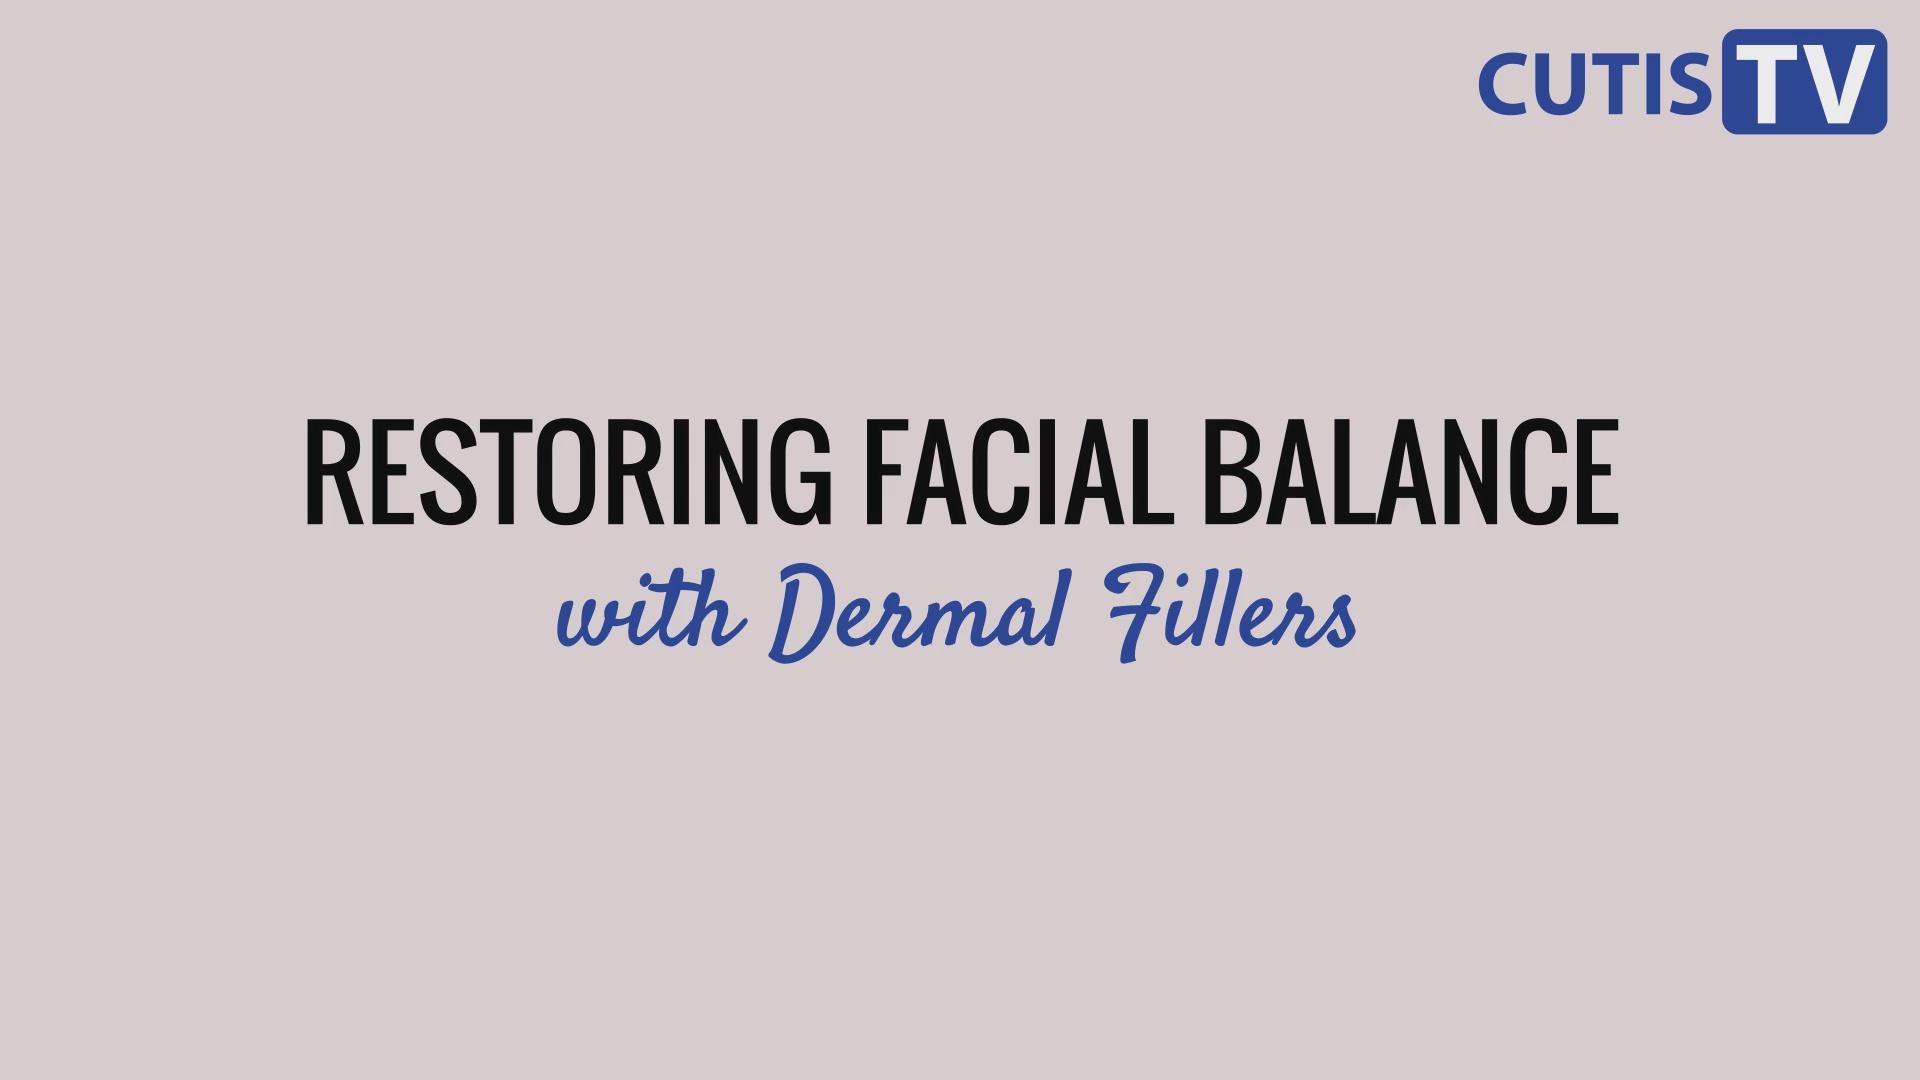 Restoring Facial Balance with Dermal Fillers